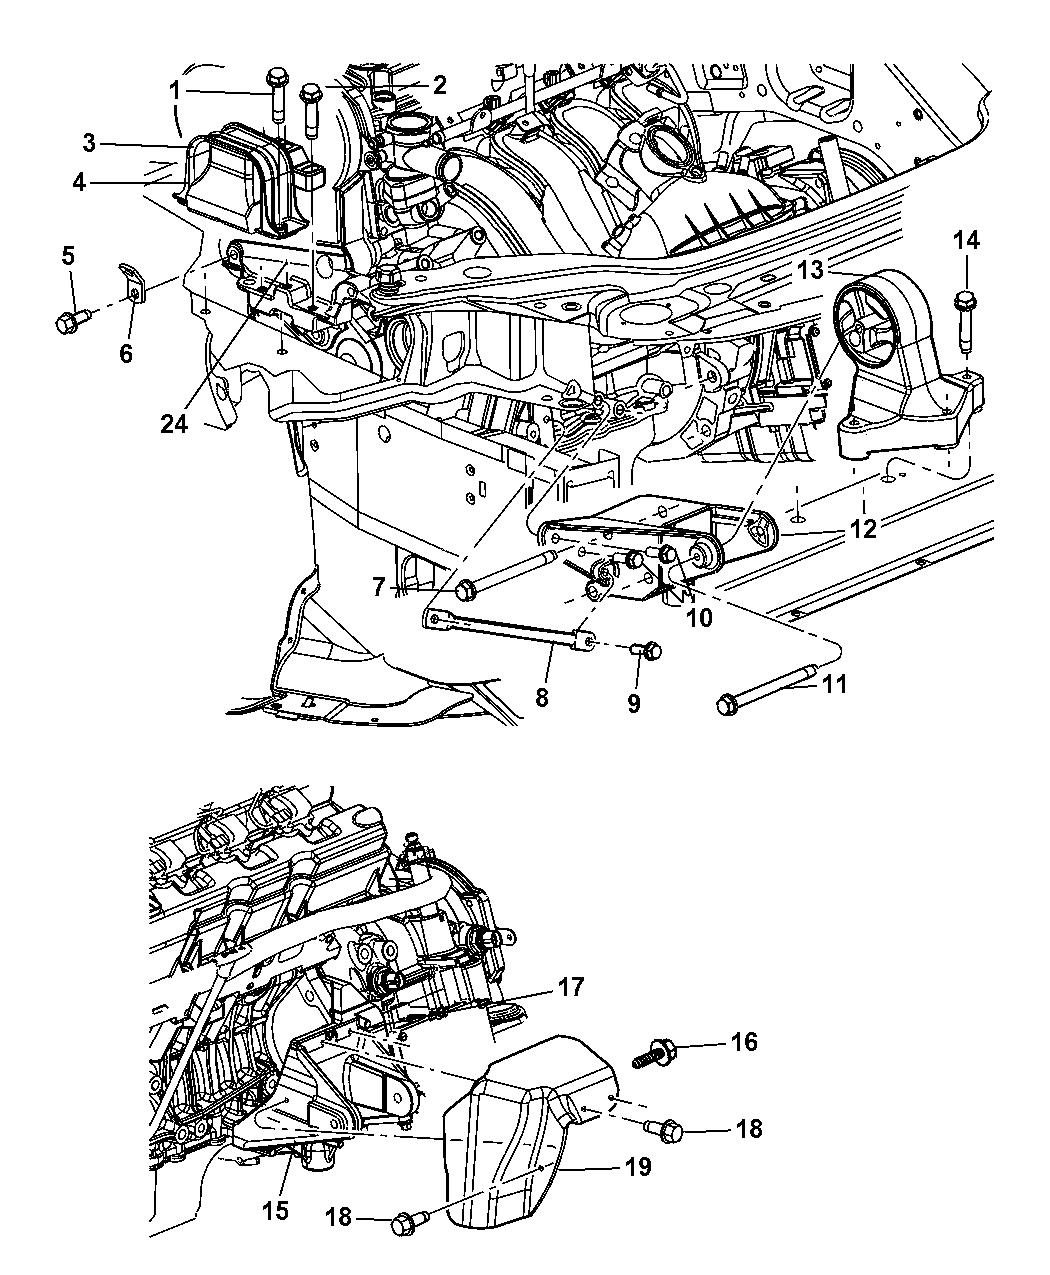 4578019AC - Genuine Mopar SUPPORT-ENGINE SUPPORTMopar Parts Giant